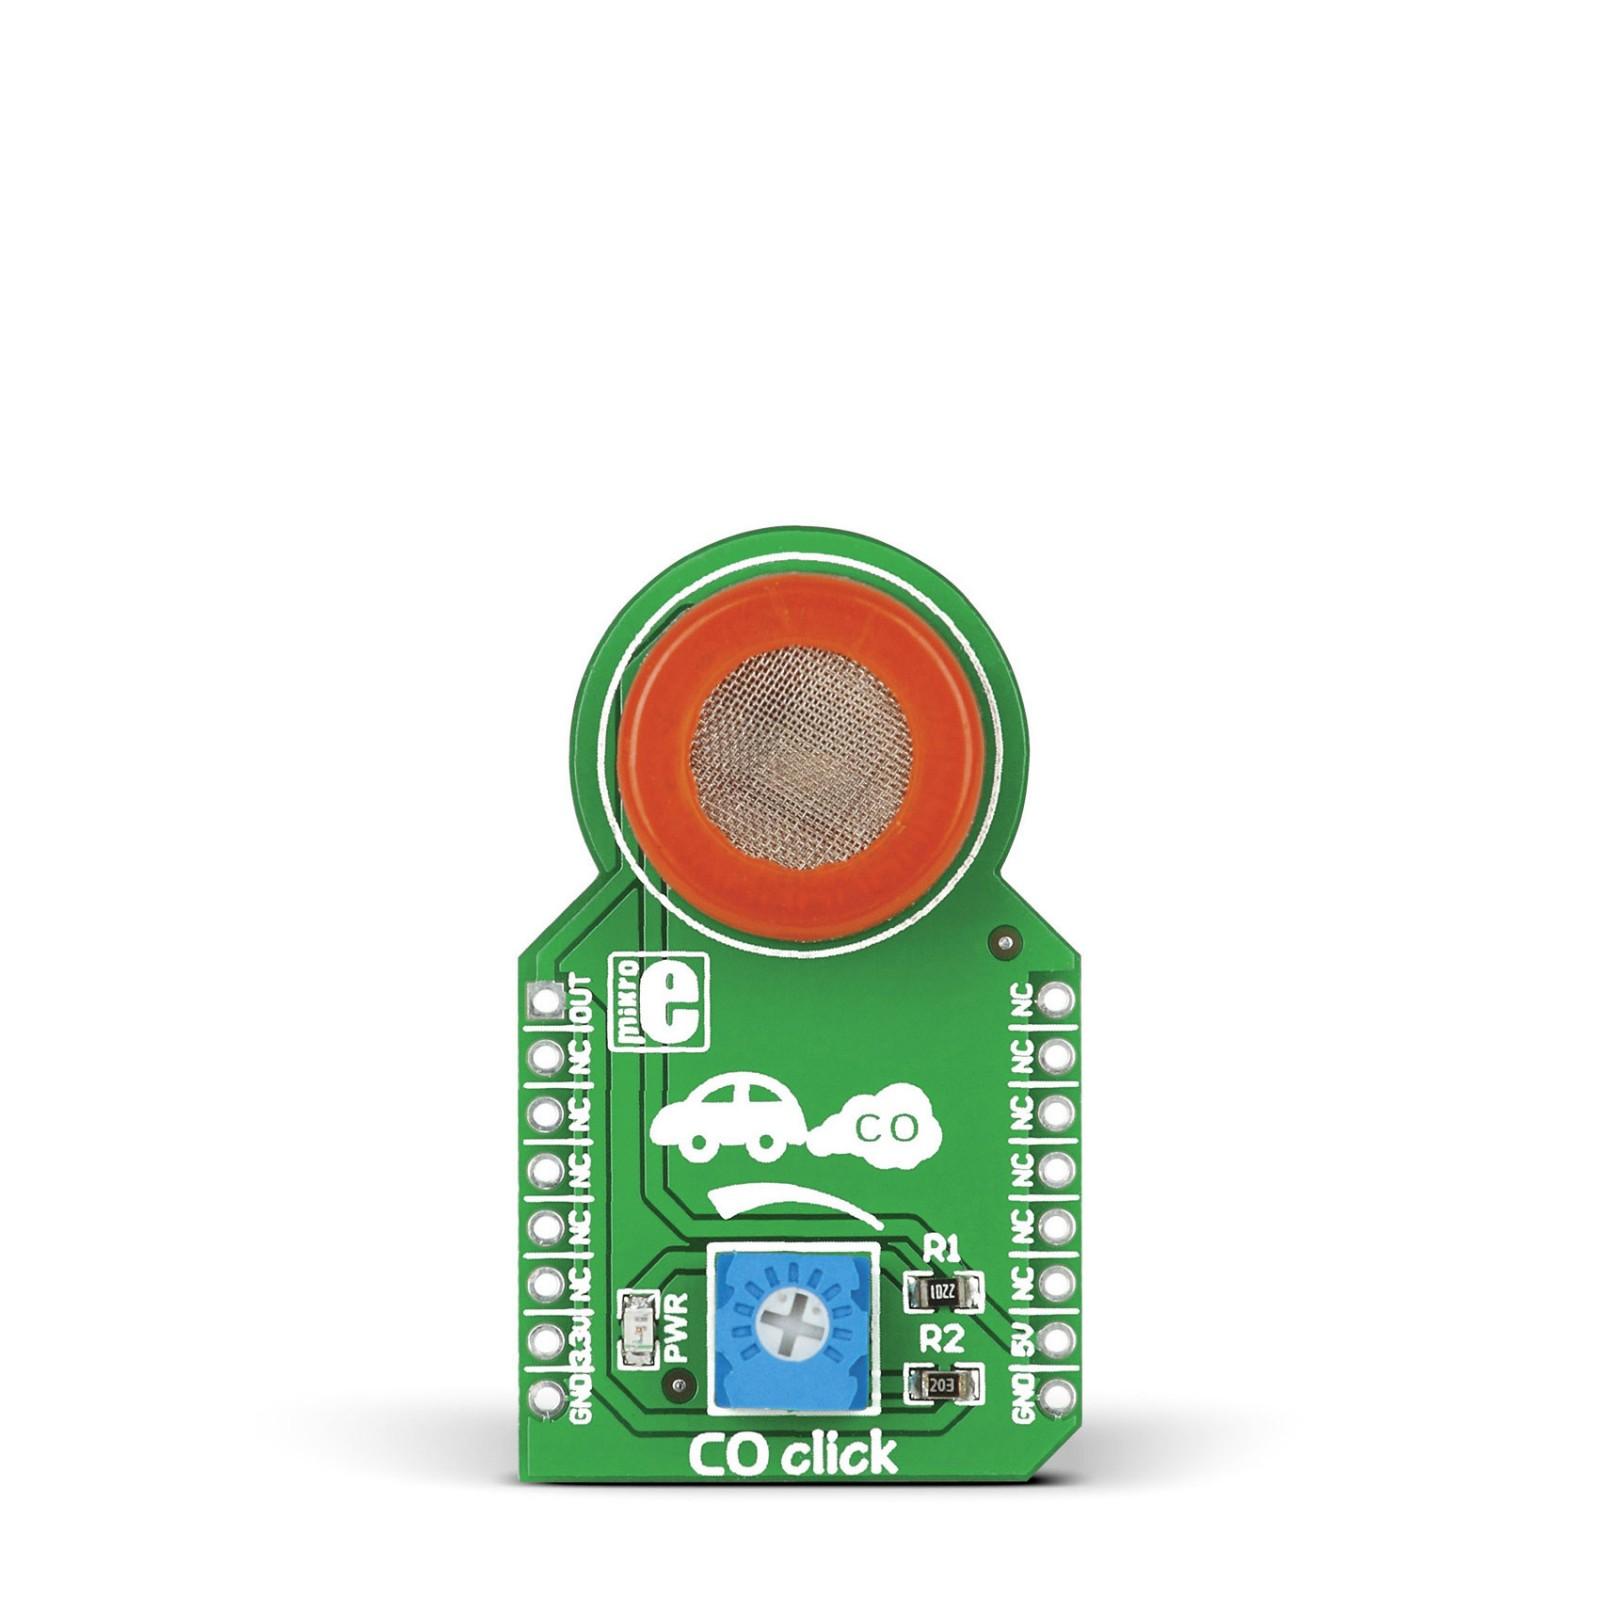 Co Click Mikrobus Board With Mq 7 Sensor For Carbon Monoxide Sensing Mq7 Circuit Diagram Mgctlbxnmzp Mgctlbxv5112 Mgctlbxlc Mgctlbxpprestashop